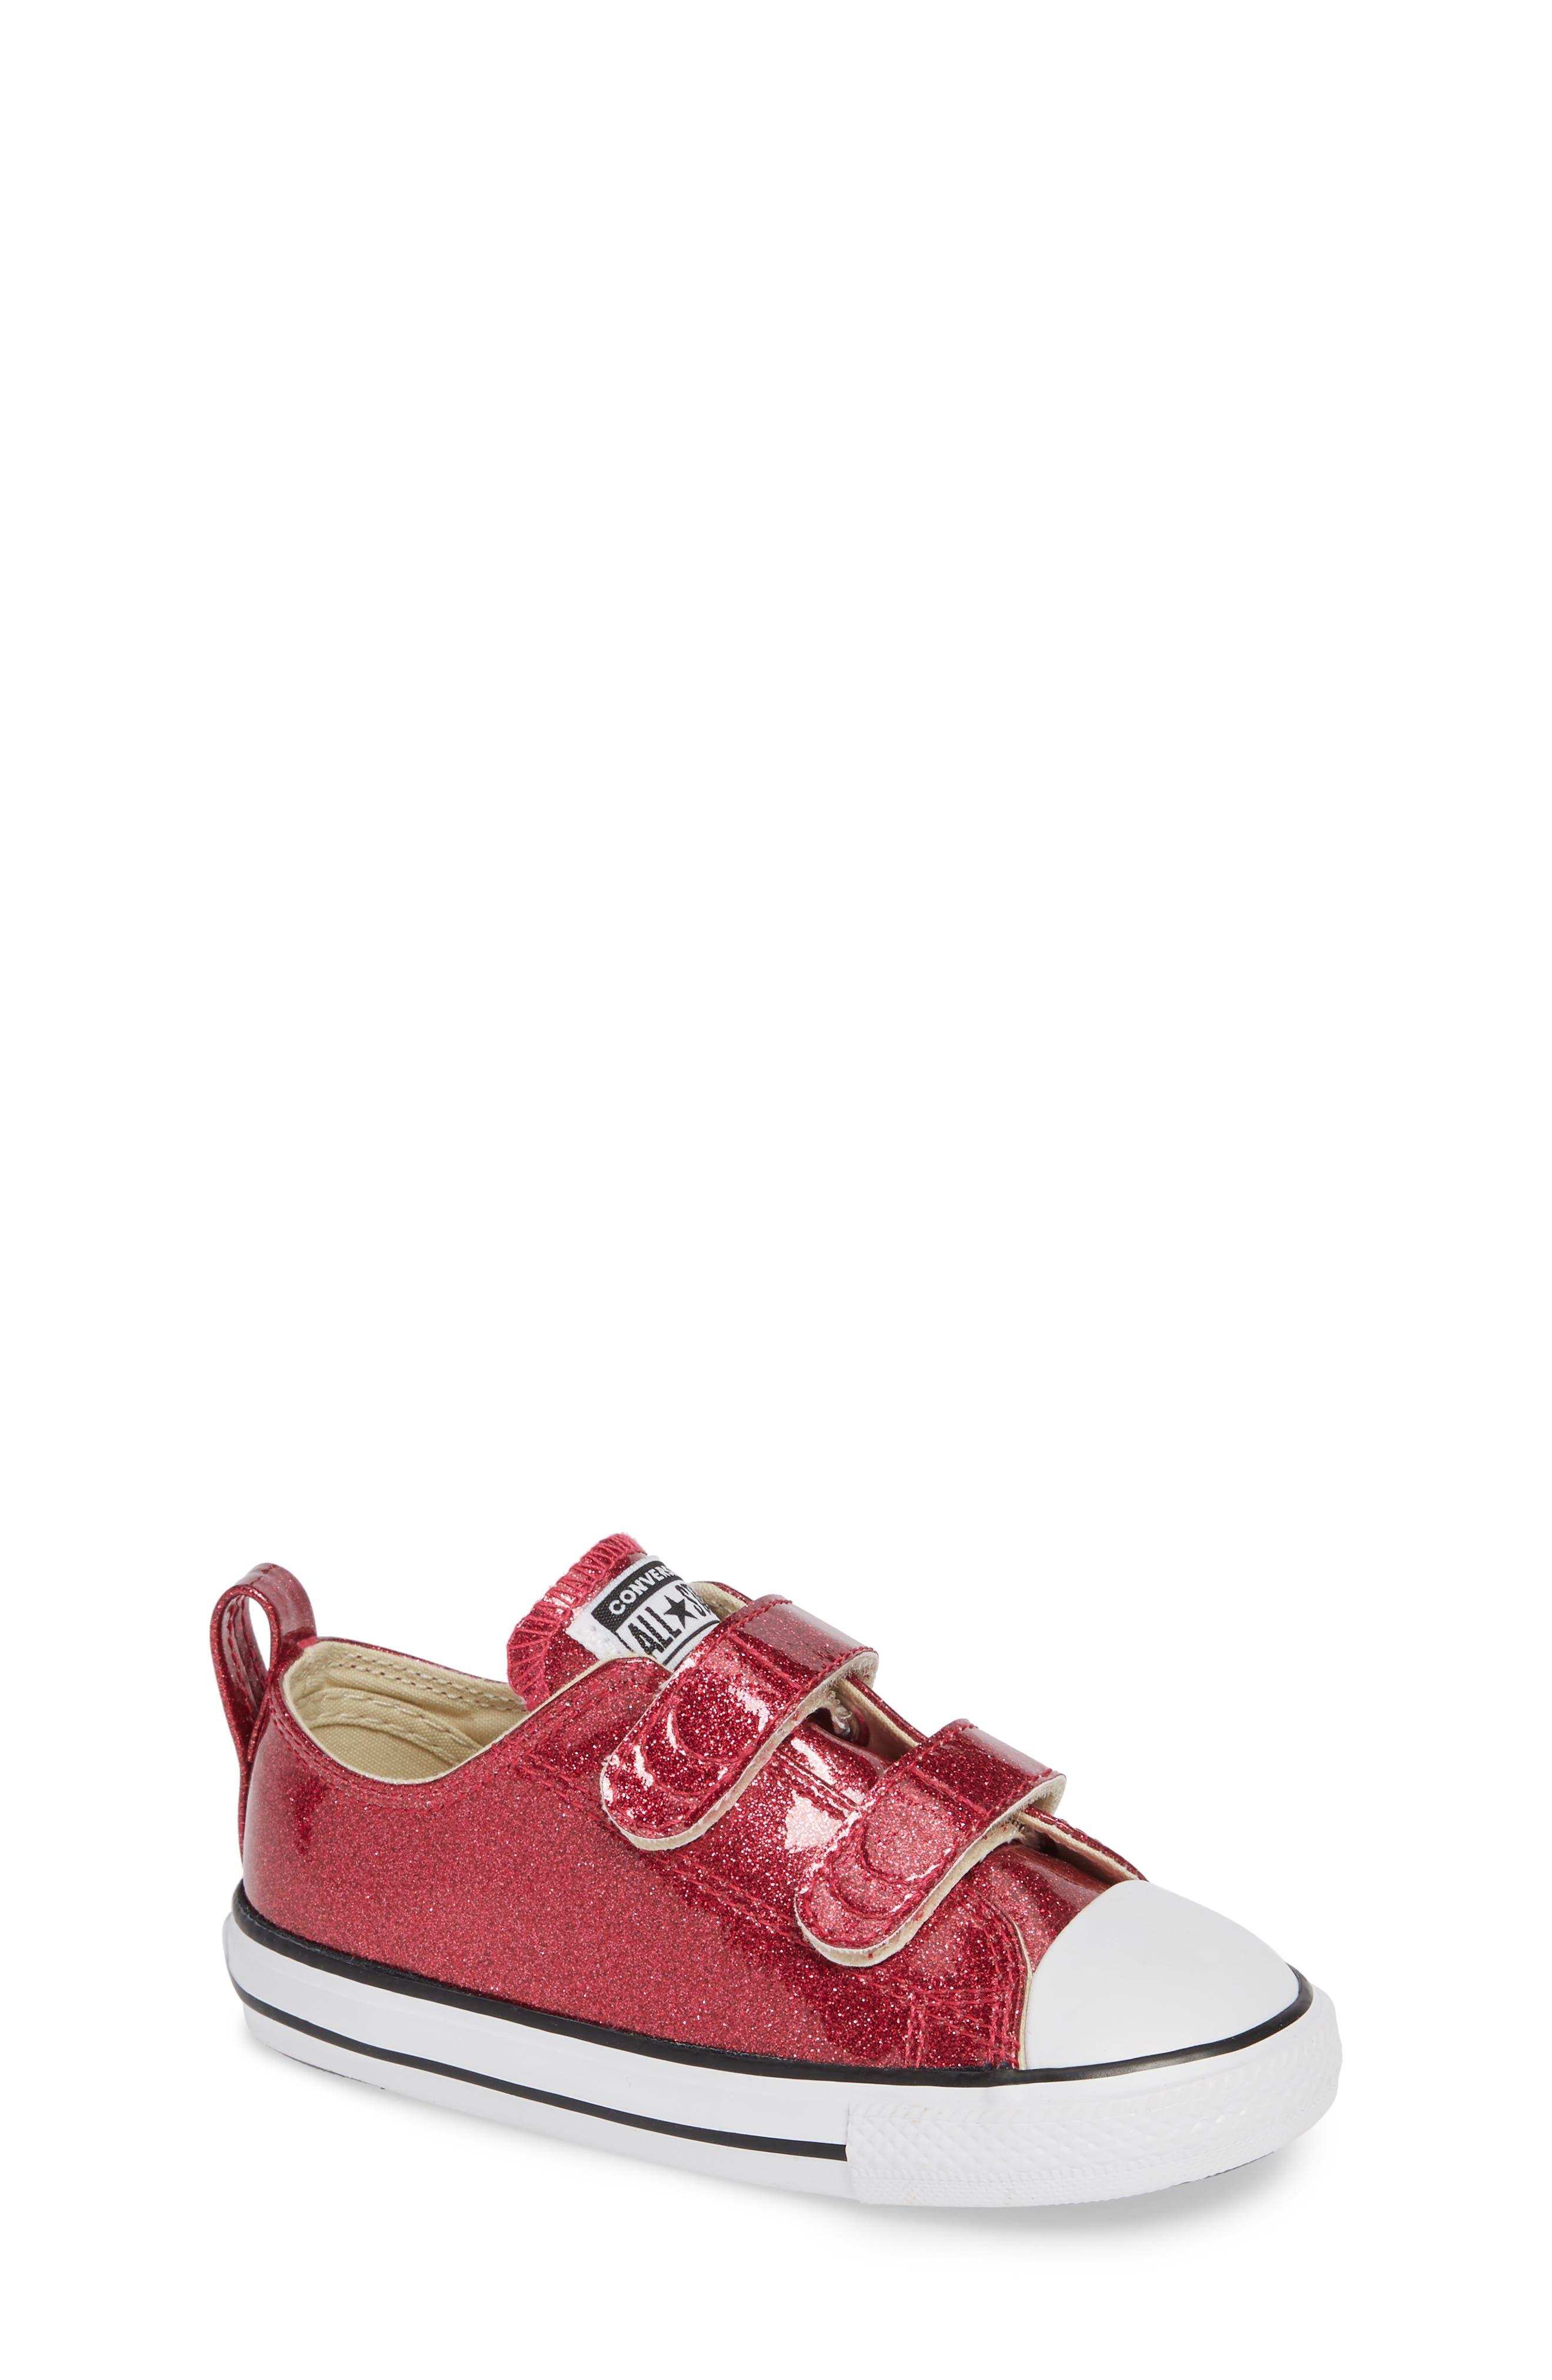 All Star<sup>®</sup> Seasonal Glitter Sneaker,                         Main,                         color, Pink Pop